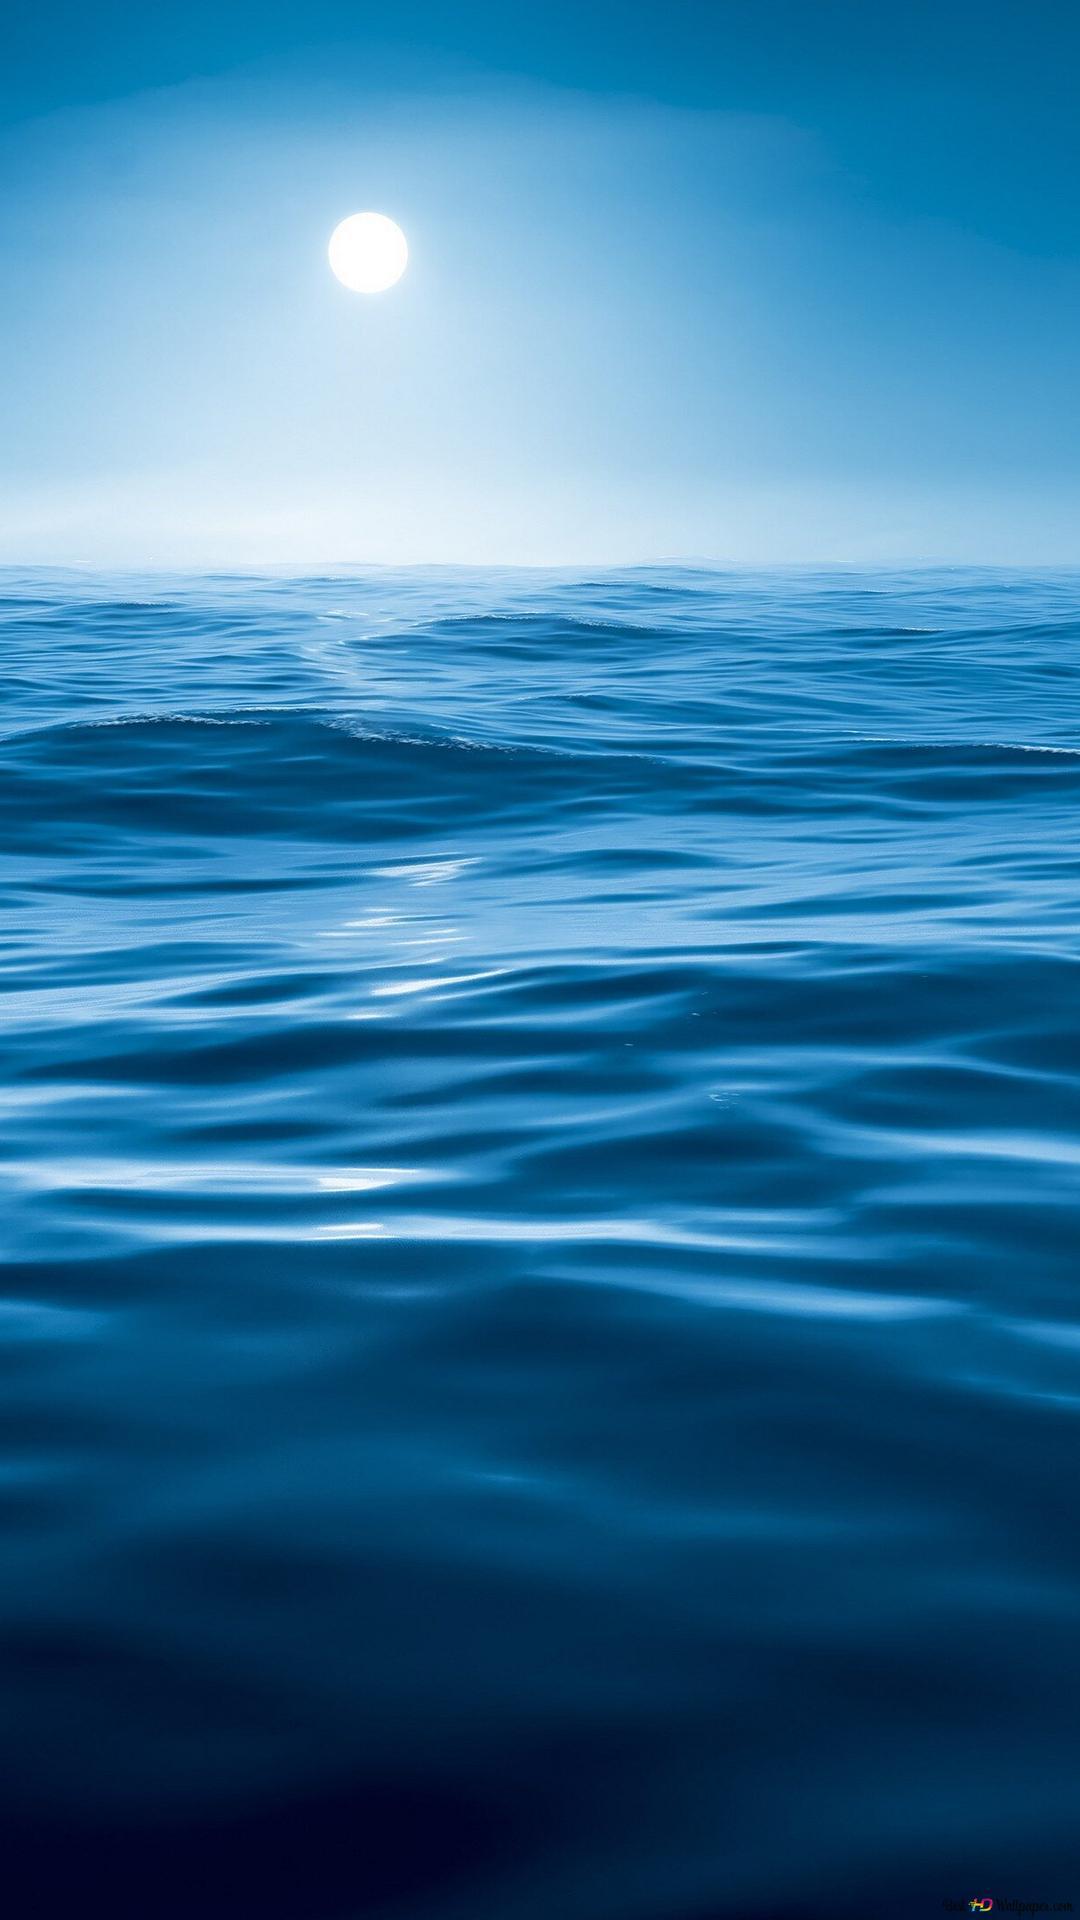 Oceano Blu Profondo Download Di Sfondi Hd